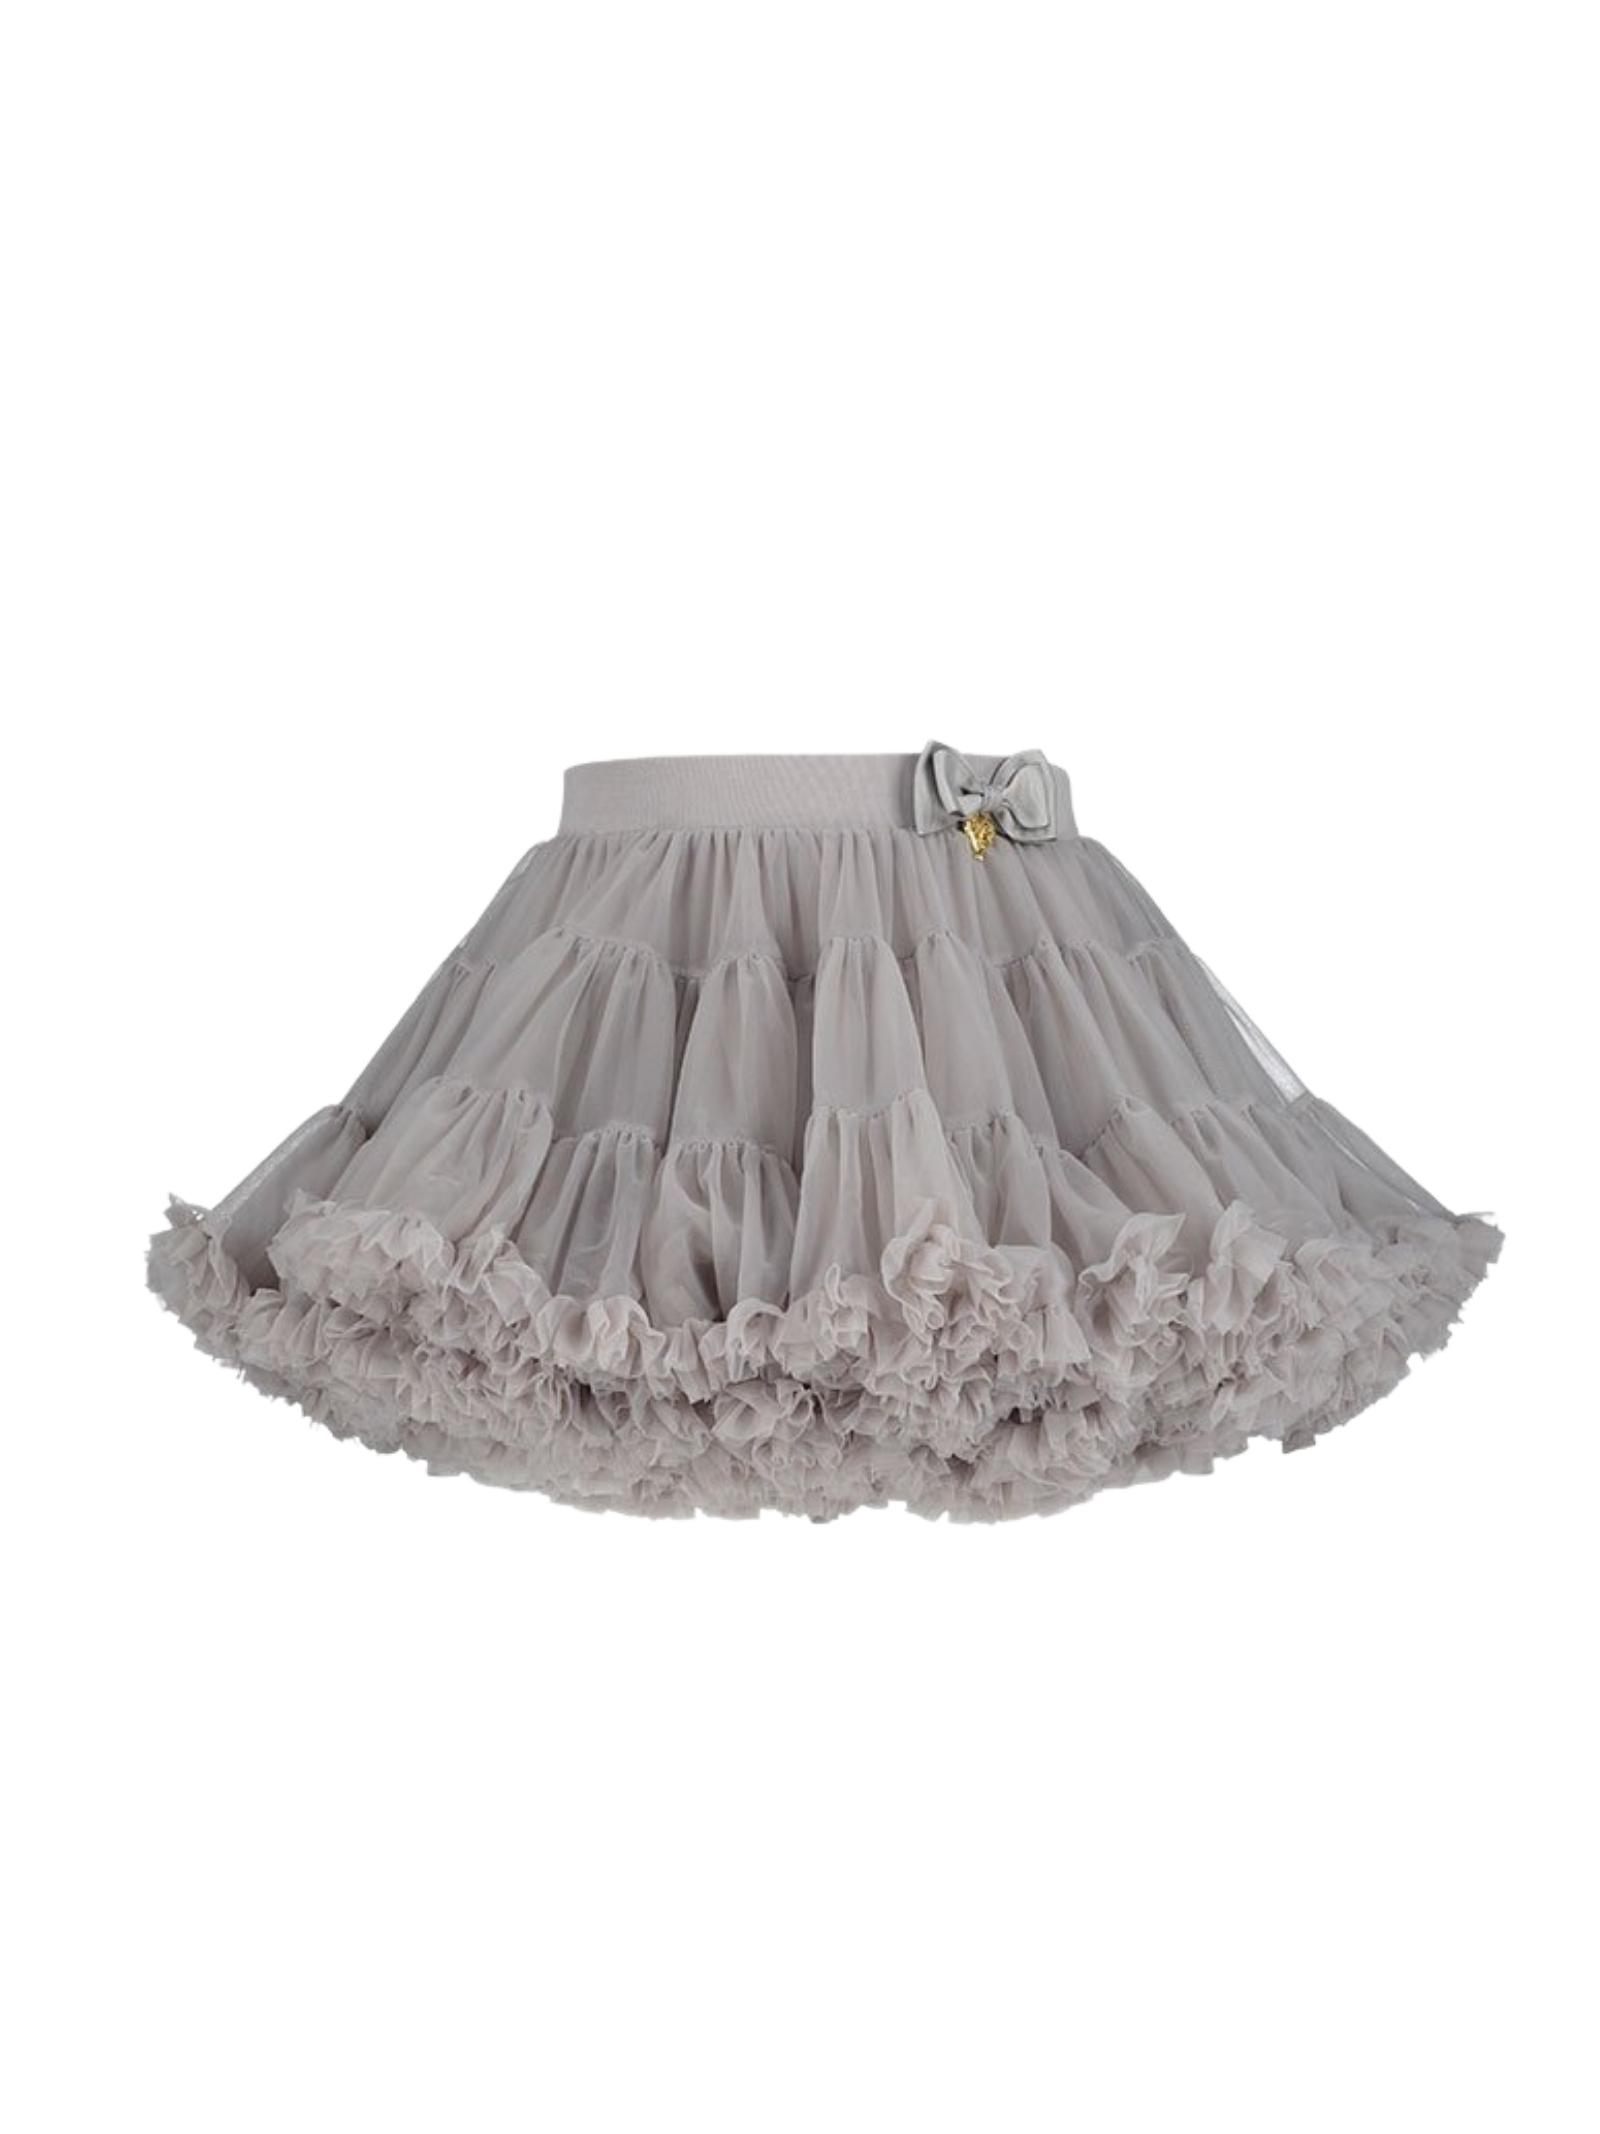 Little Girl Tutu Pixie Silver Cloud Skirt ANGEL'S FACE | Skirts | PIXIESILVER